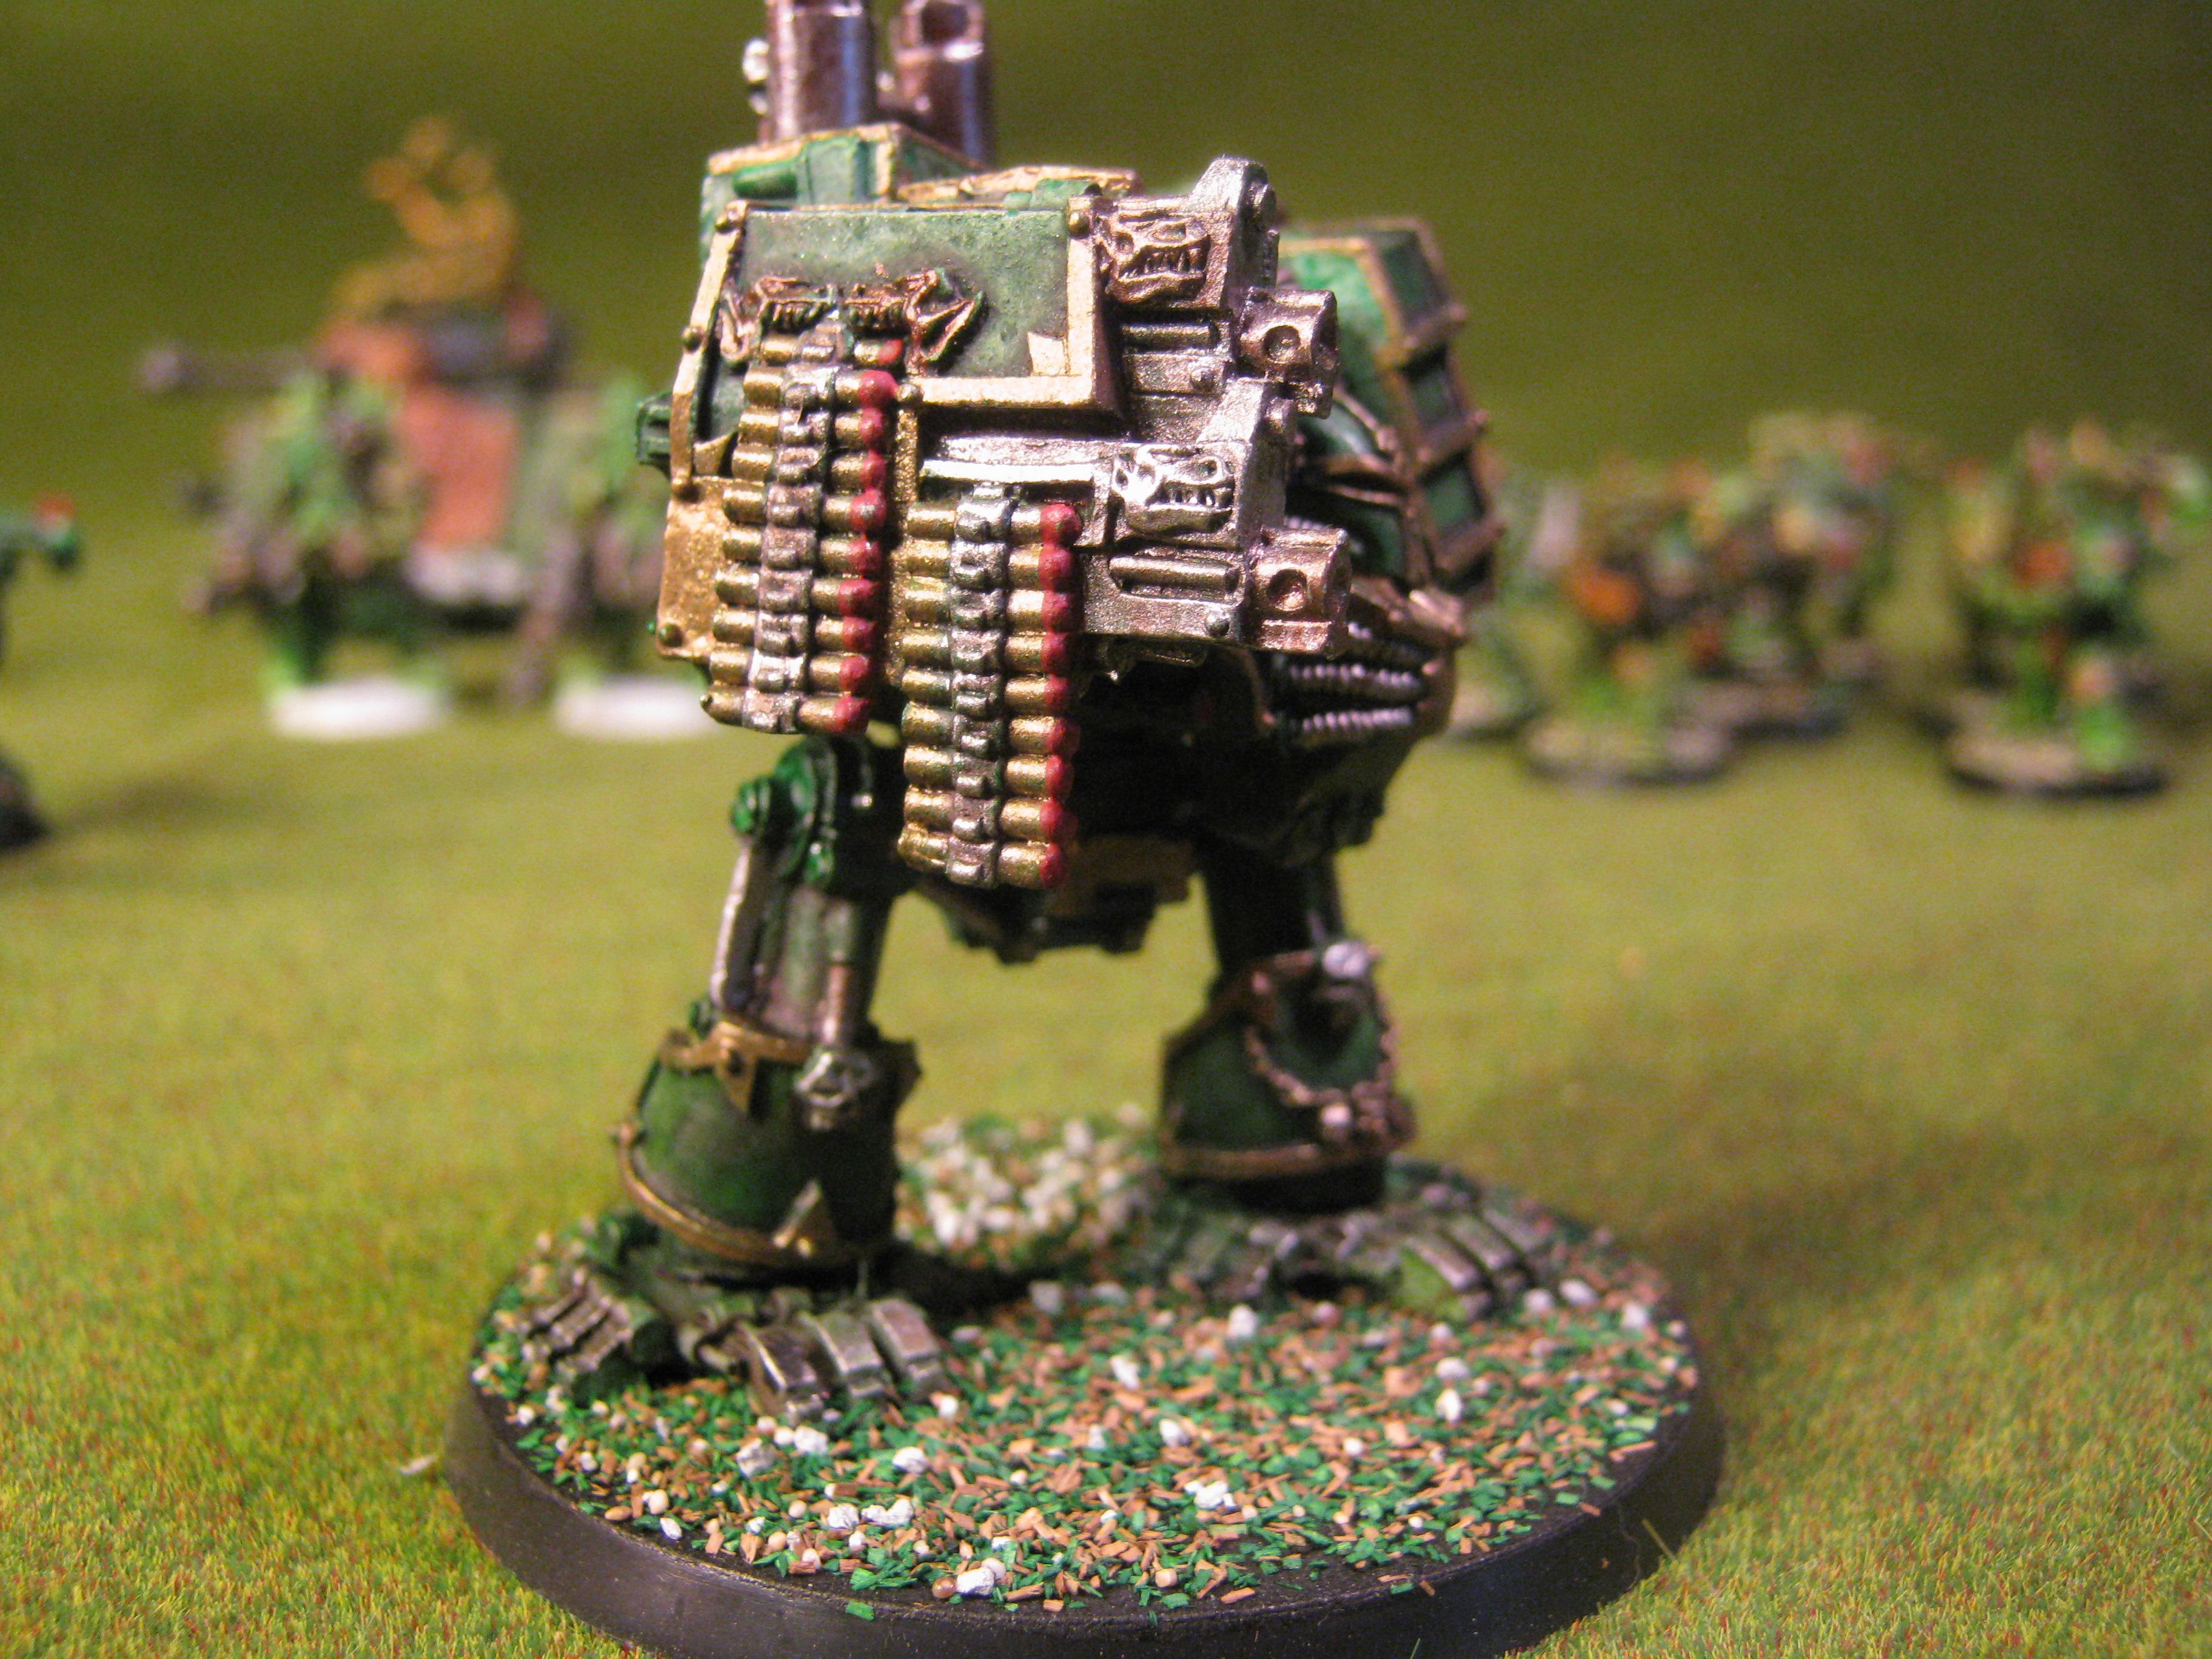 Chaos Dreadnought, Chaos Space Marines, Death Guard, Nurgle, Plague Marines, Warhammer 40,000